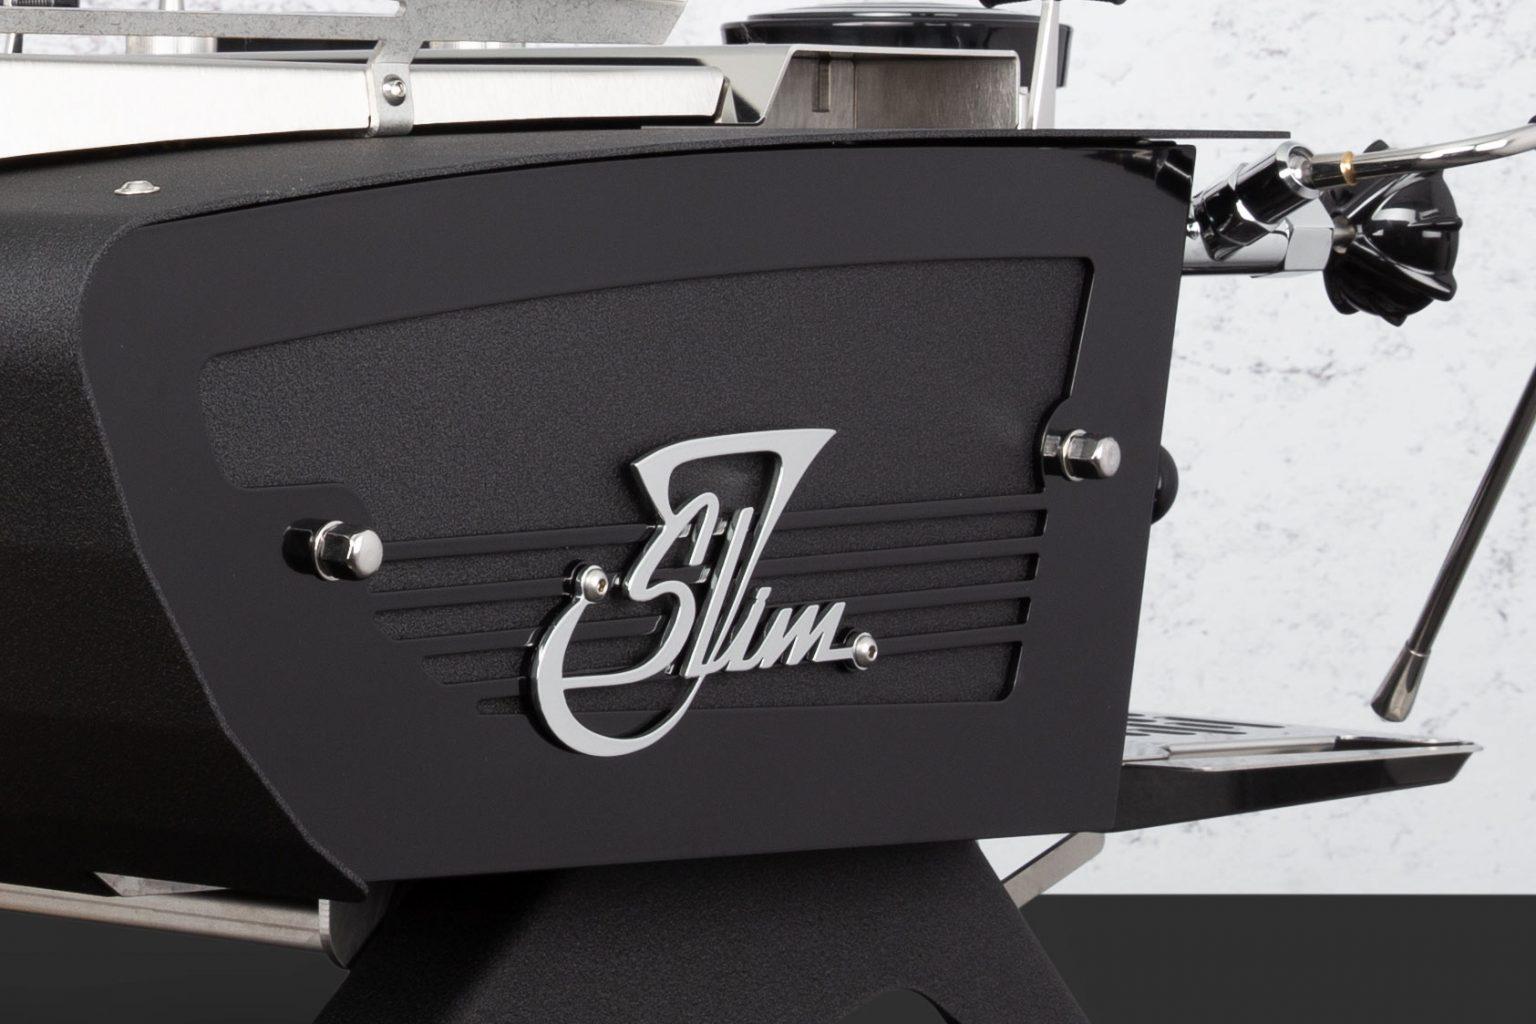 Multi Boiler Espresso Machine Slim Jim